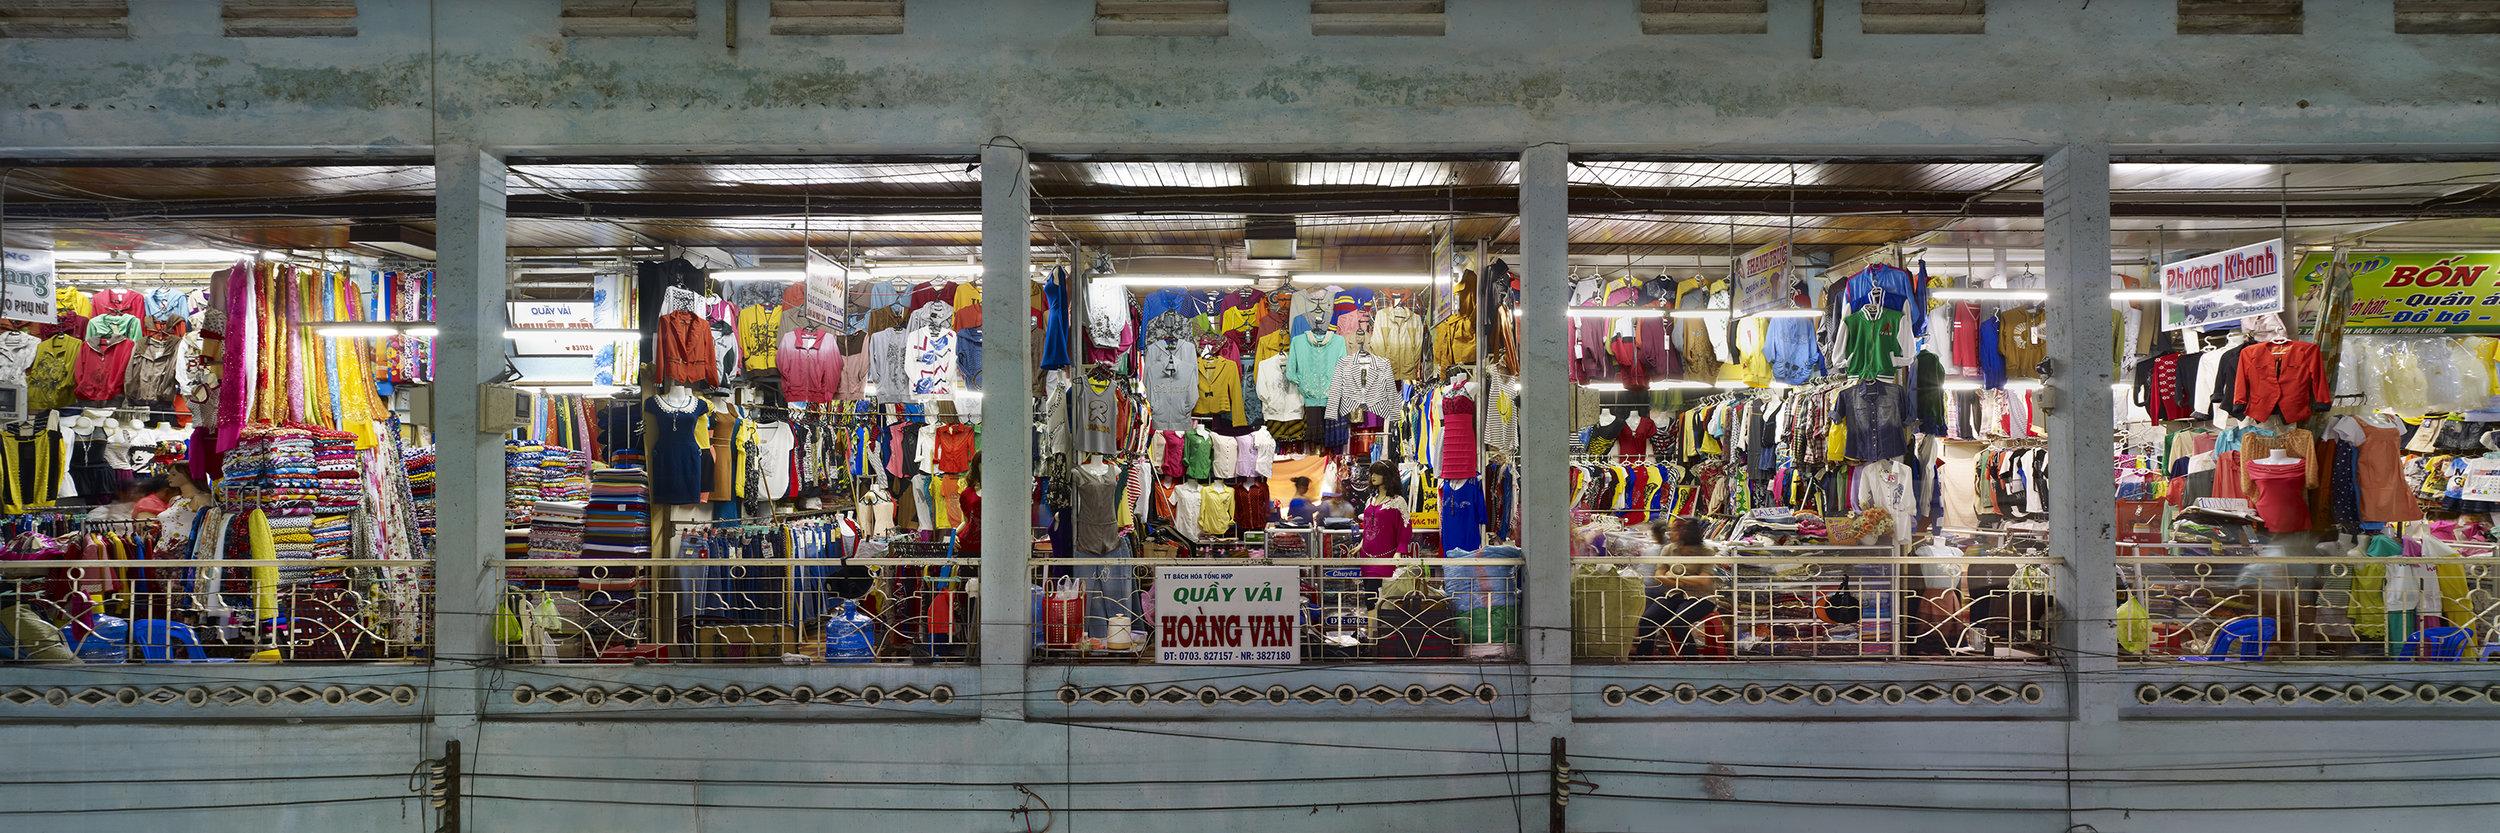 5 Shops, Vinh Long Market - 2013.jpg